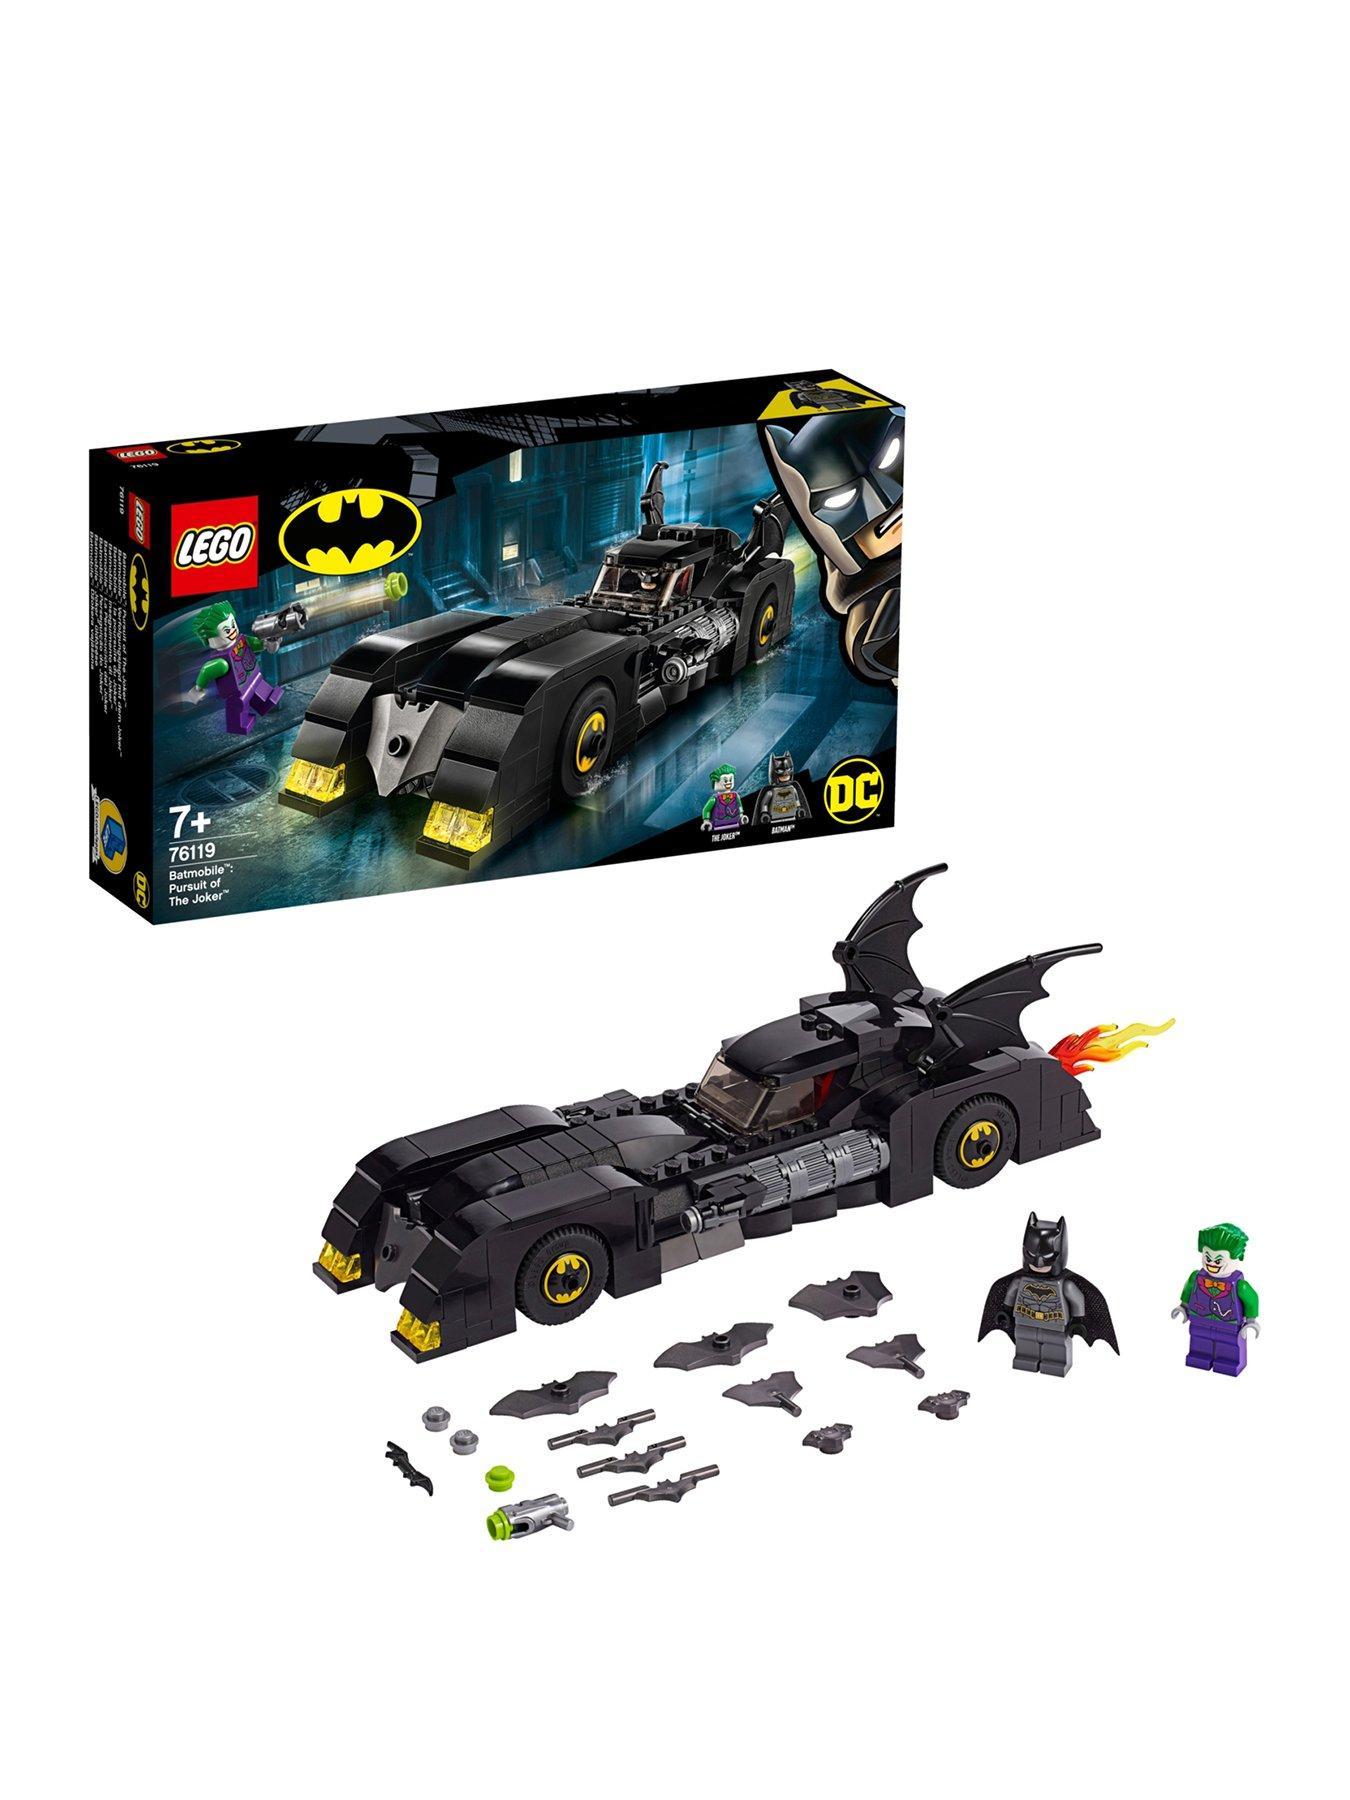 LYL BRICK Custom Joker Lego minifigure